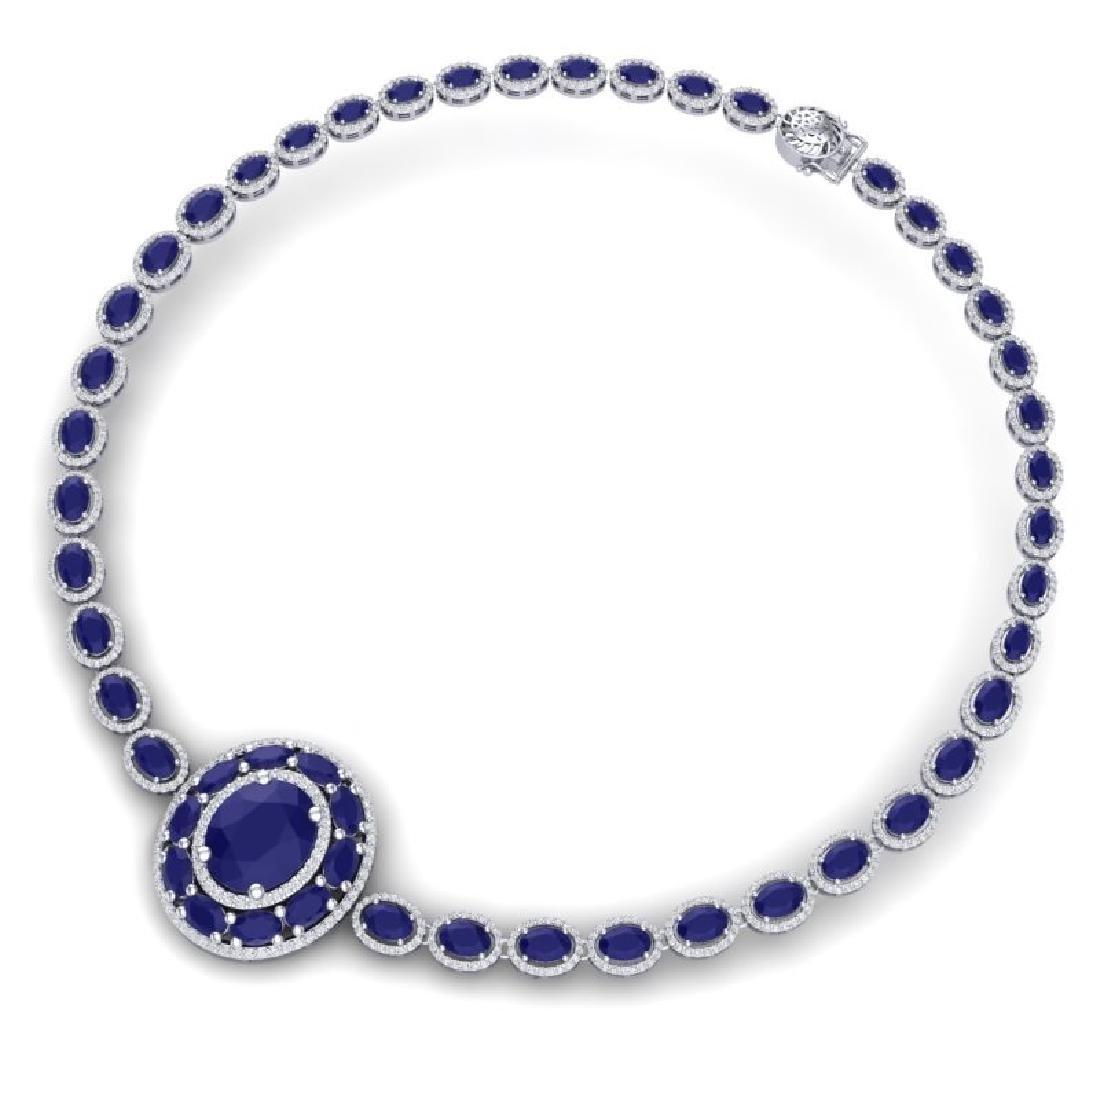 43.54 CTW Royalty Sapphire & VS Diamond Necklace 18K - 3